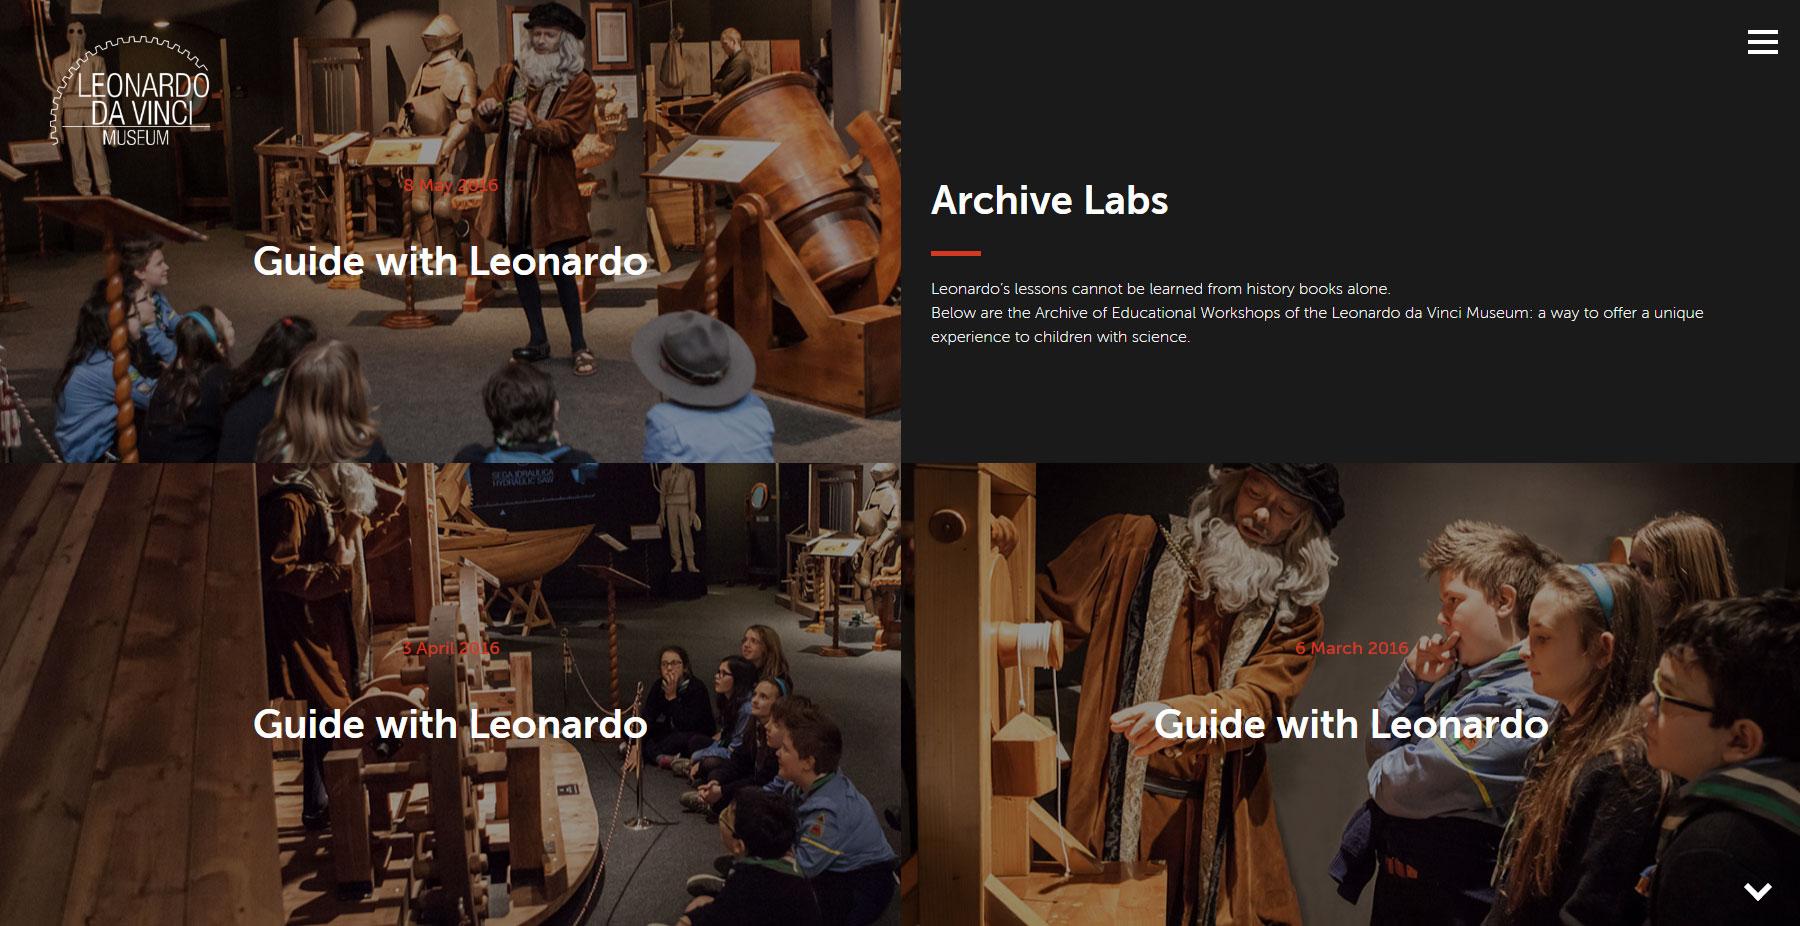 Museo Leonardo da Vinci - Website of the Day